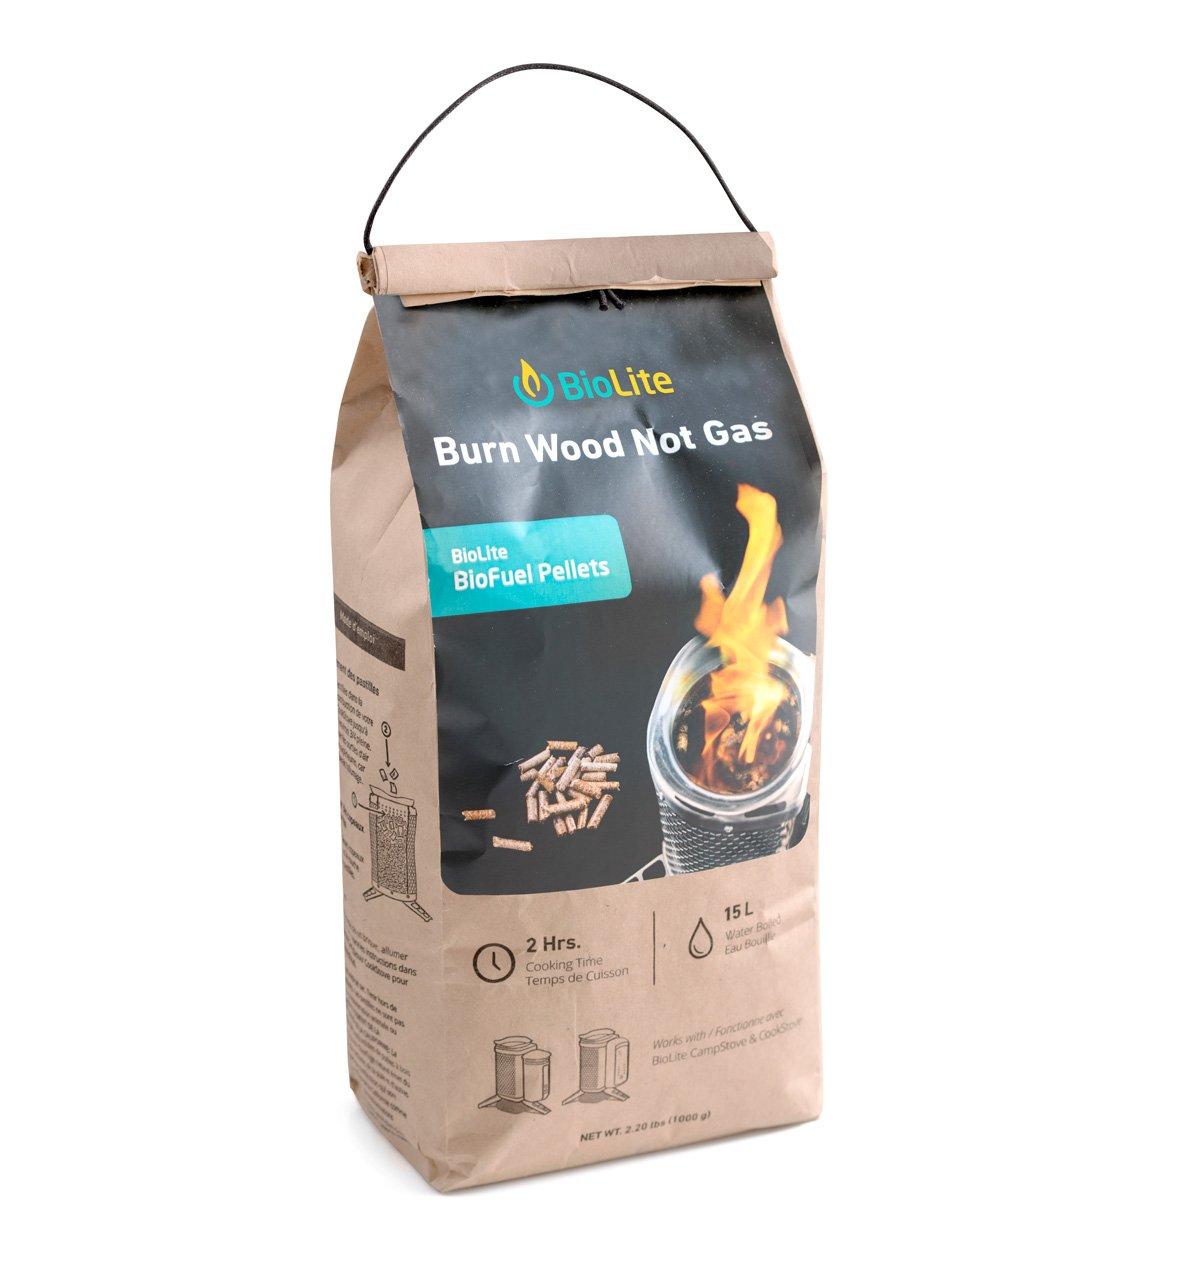 Biolite Premium Food-Safe Hardwood Grilling Pellets: Amazon.es: Deportes y aire libre